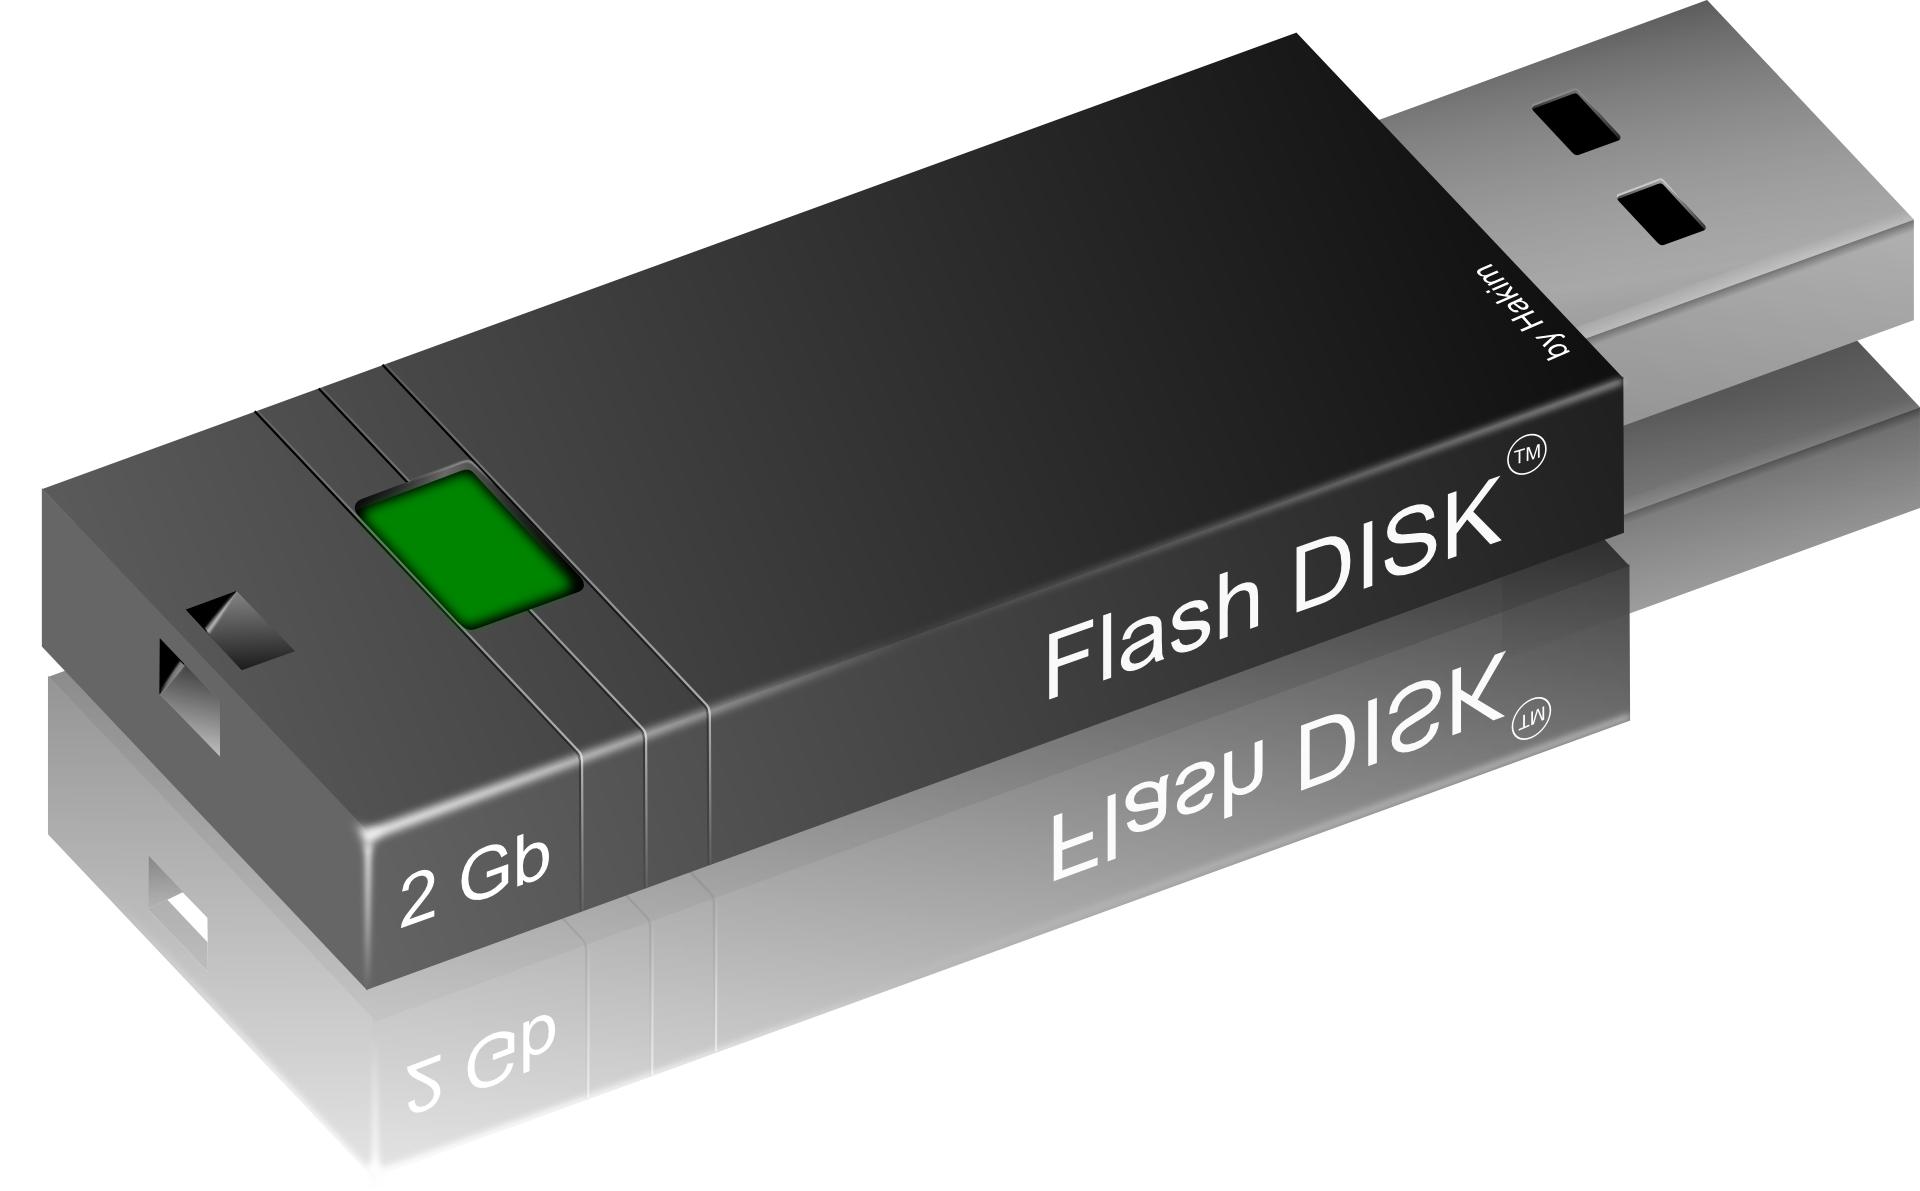 Black Flash disk,USB drives vector